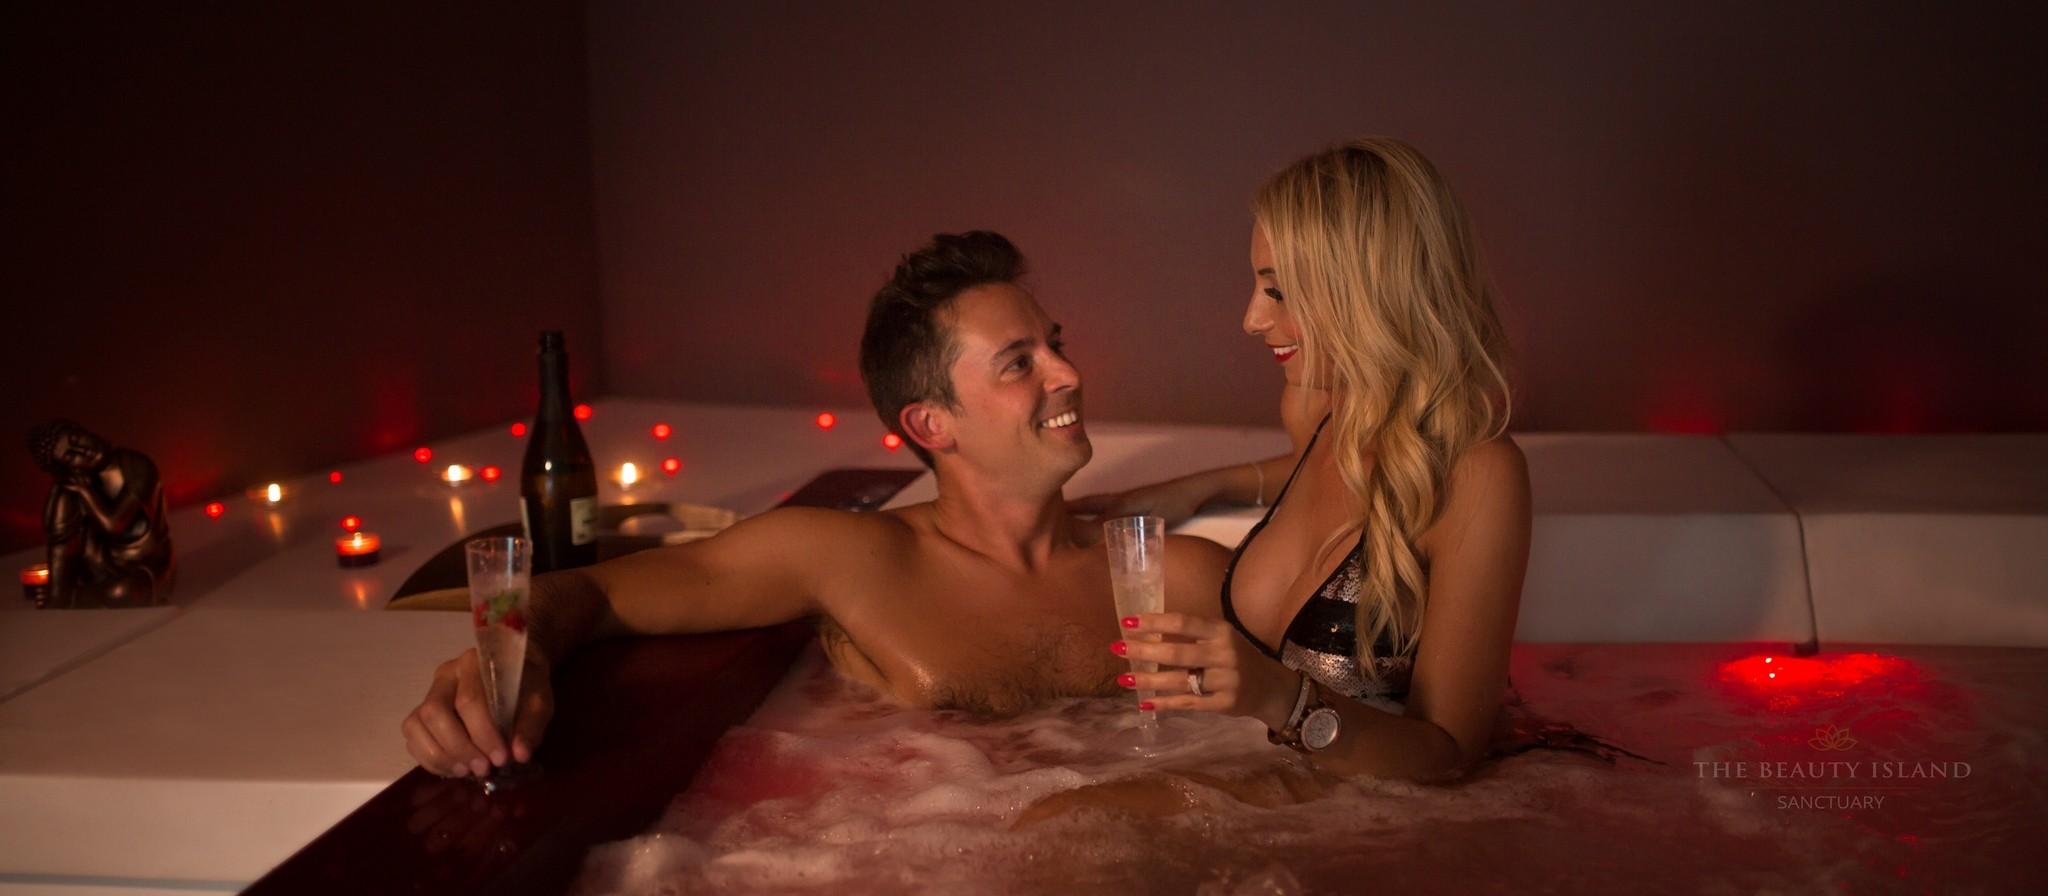 The Beauty Island  spa & treatments (10)